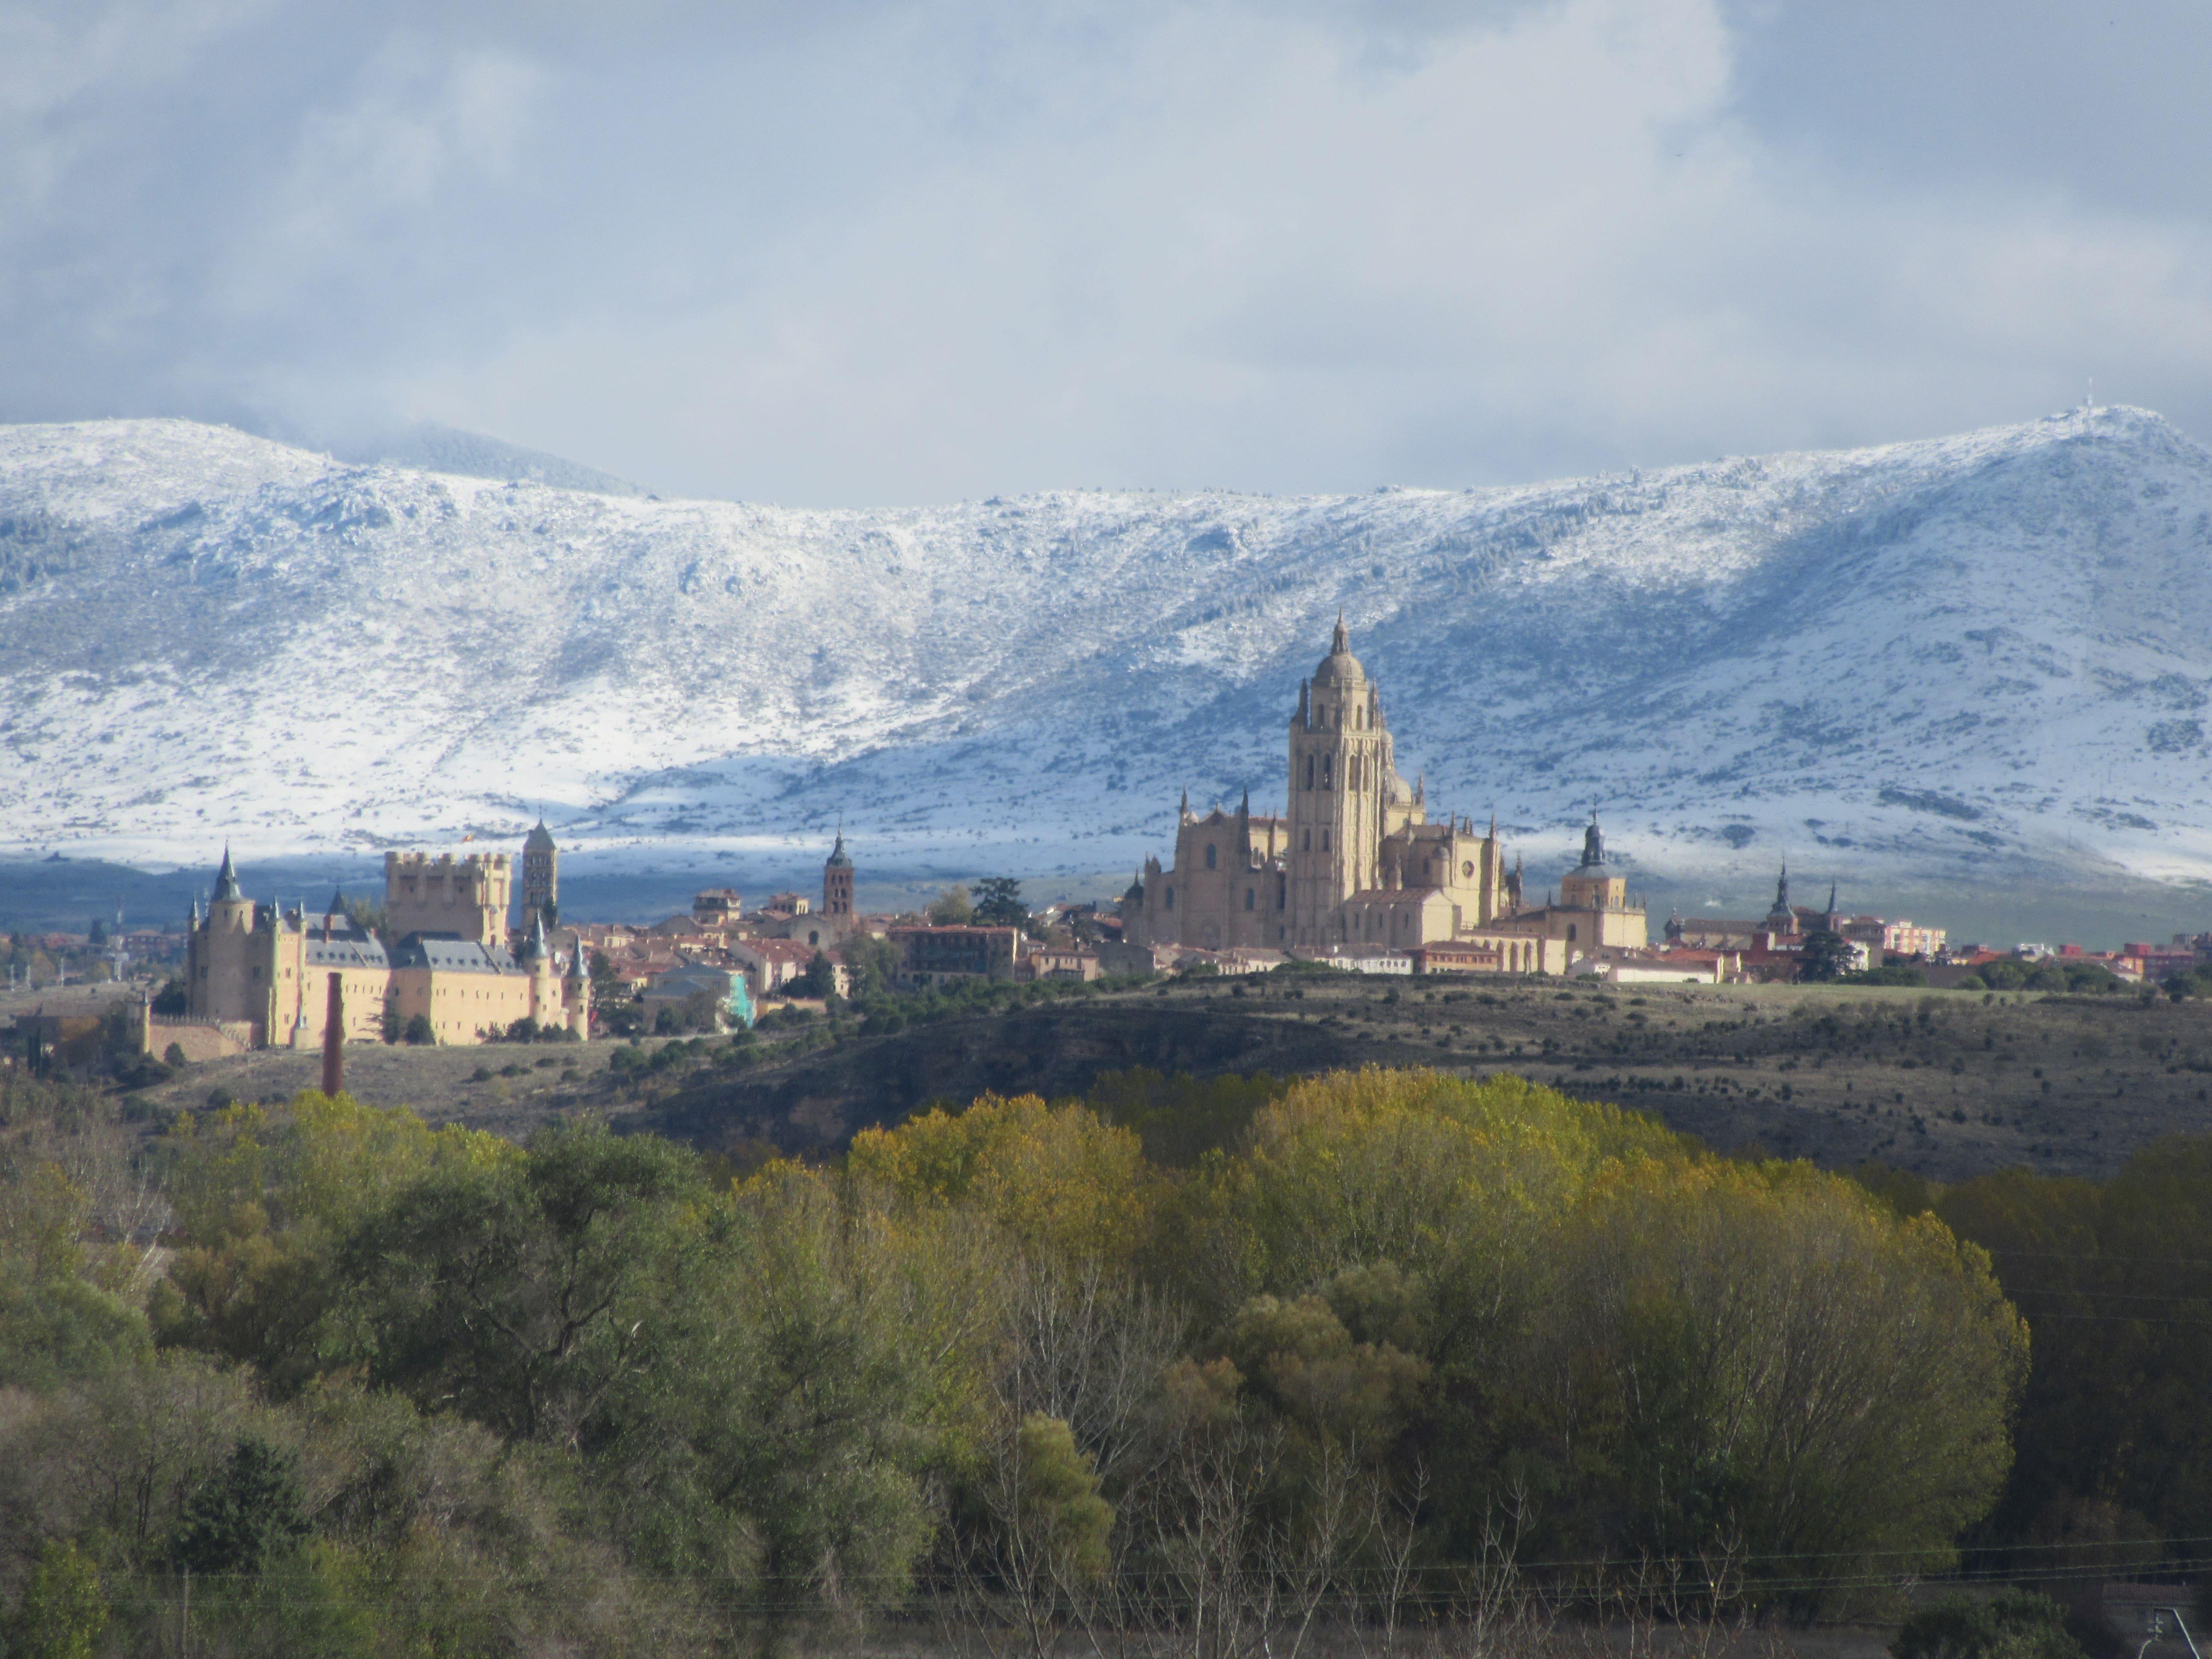 La ville de Ségovia en Espagne